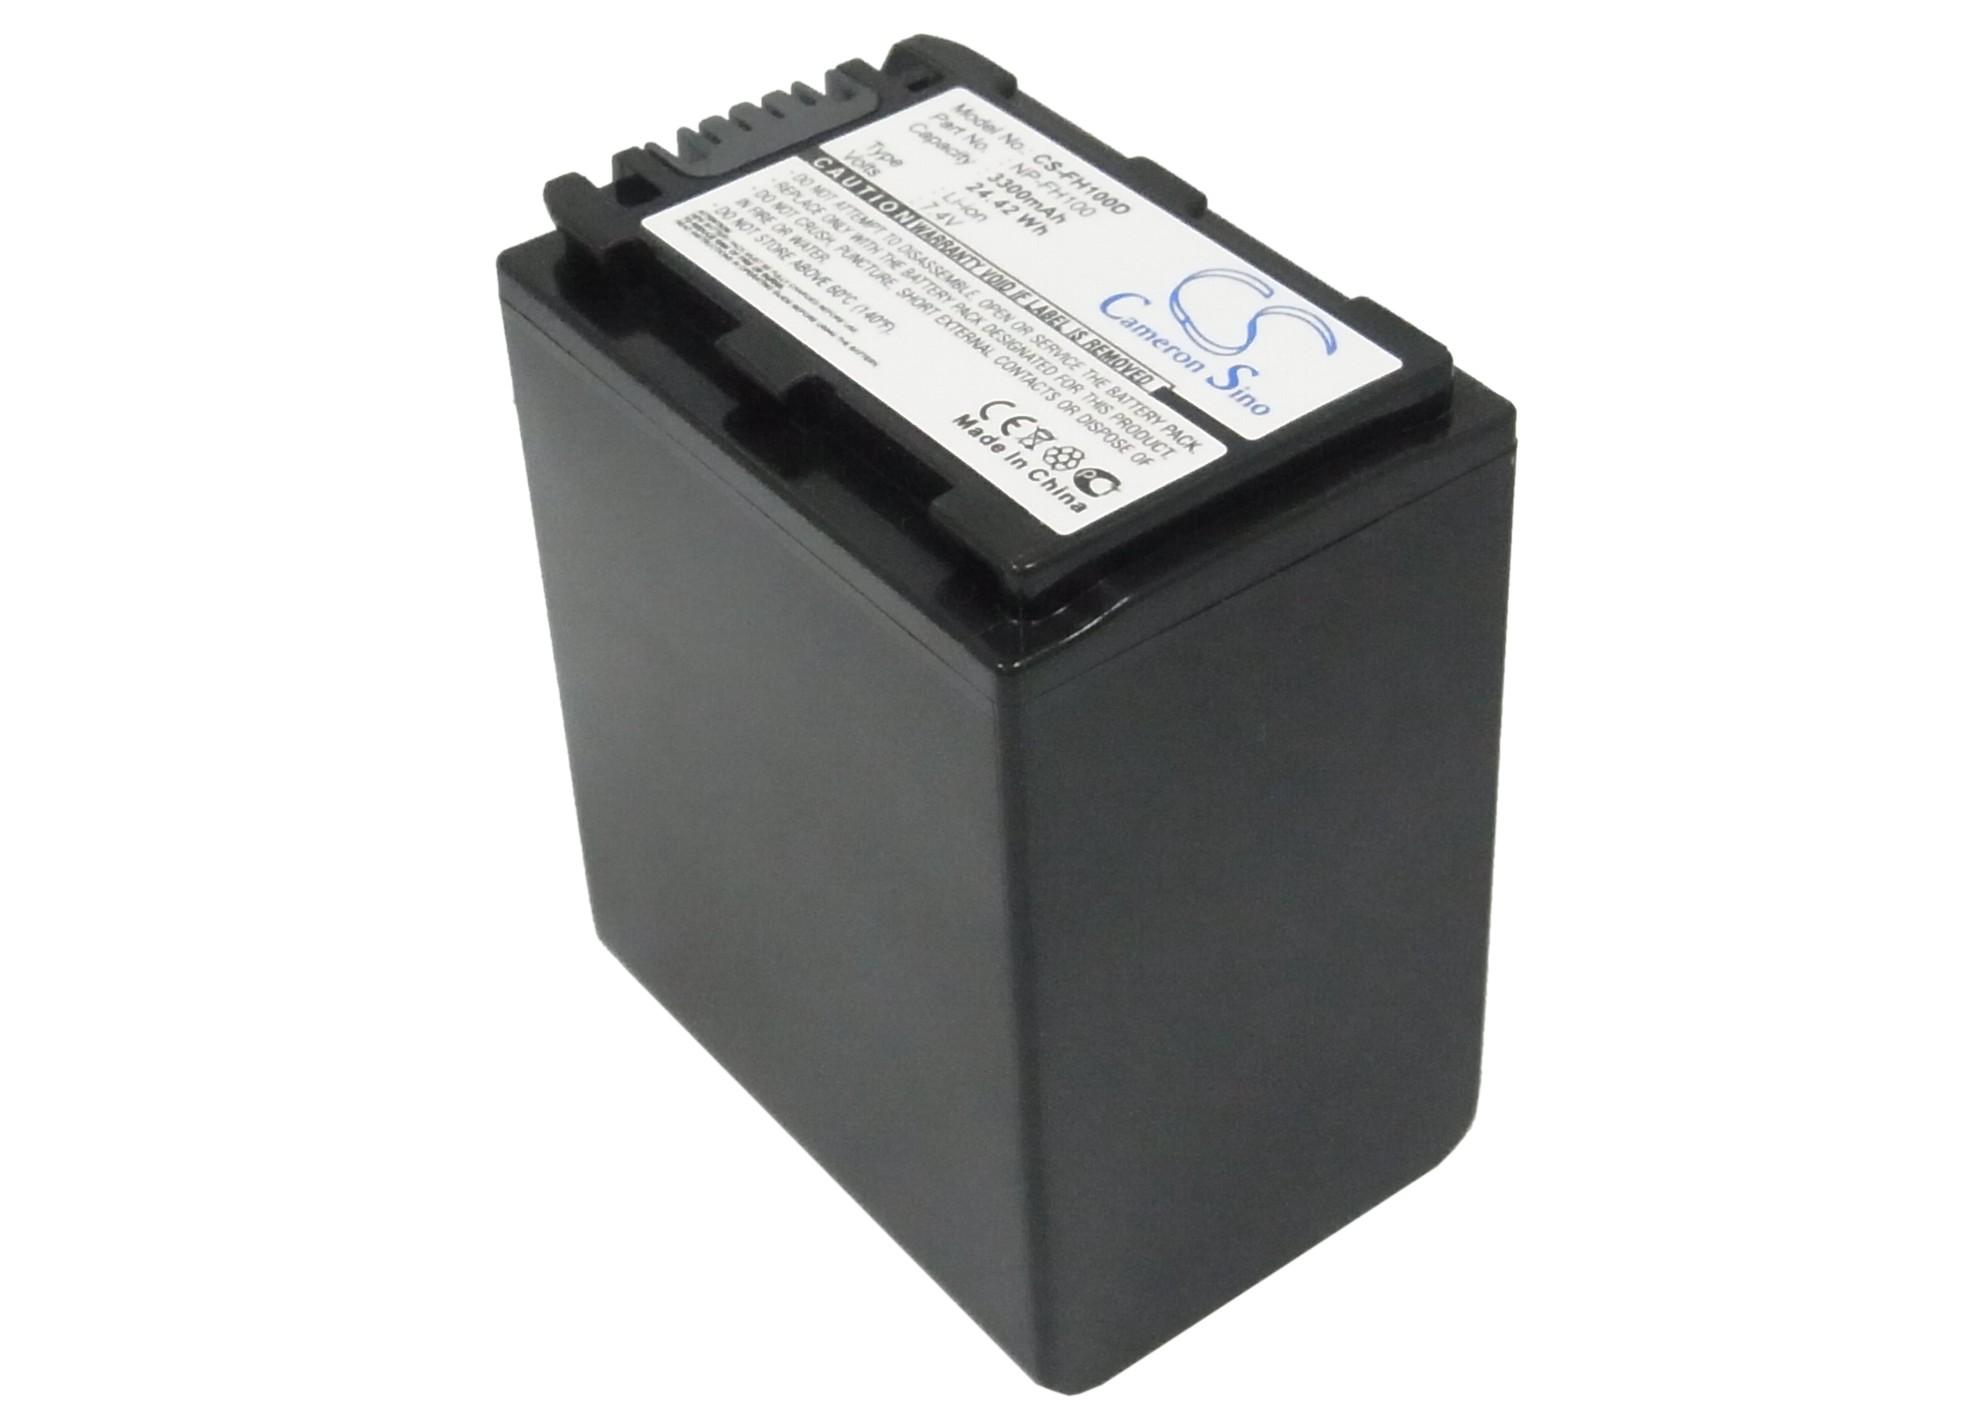 Cameron Sino baterie do kamer a fotoaparátů pro SONY DCR-DVD203E 7.4V Li-ion 3300mAh tmavě šedá - neoriginální